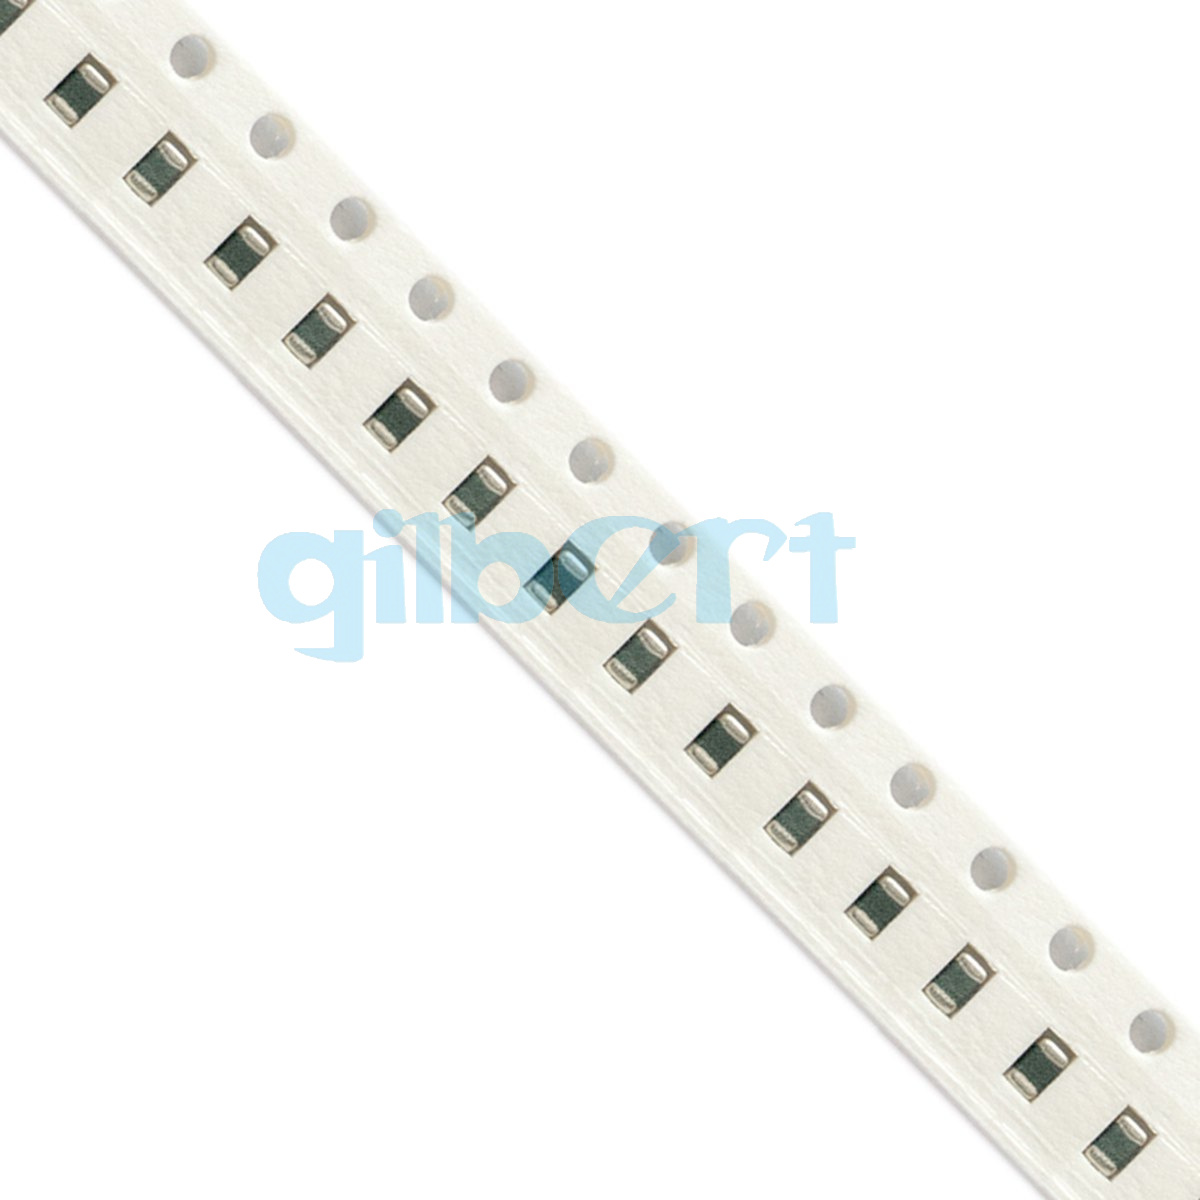 100pcs SMD 0603 47PF 470J X7R Chip Capacitors Electron Component 50V